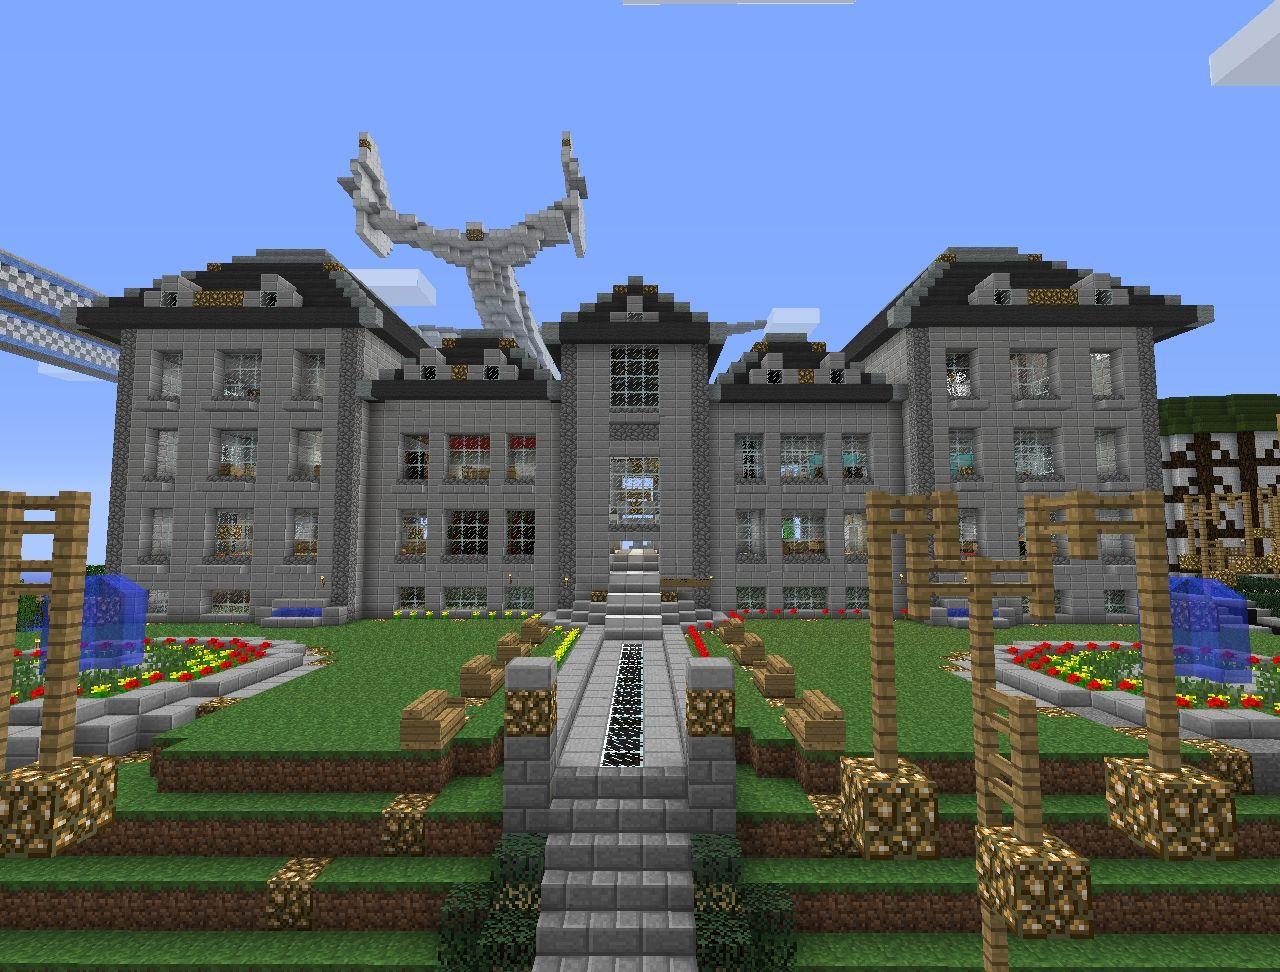 Chateau de cheverny minecraft project - Chateau de minecraft ...